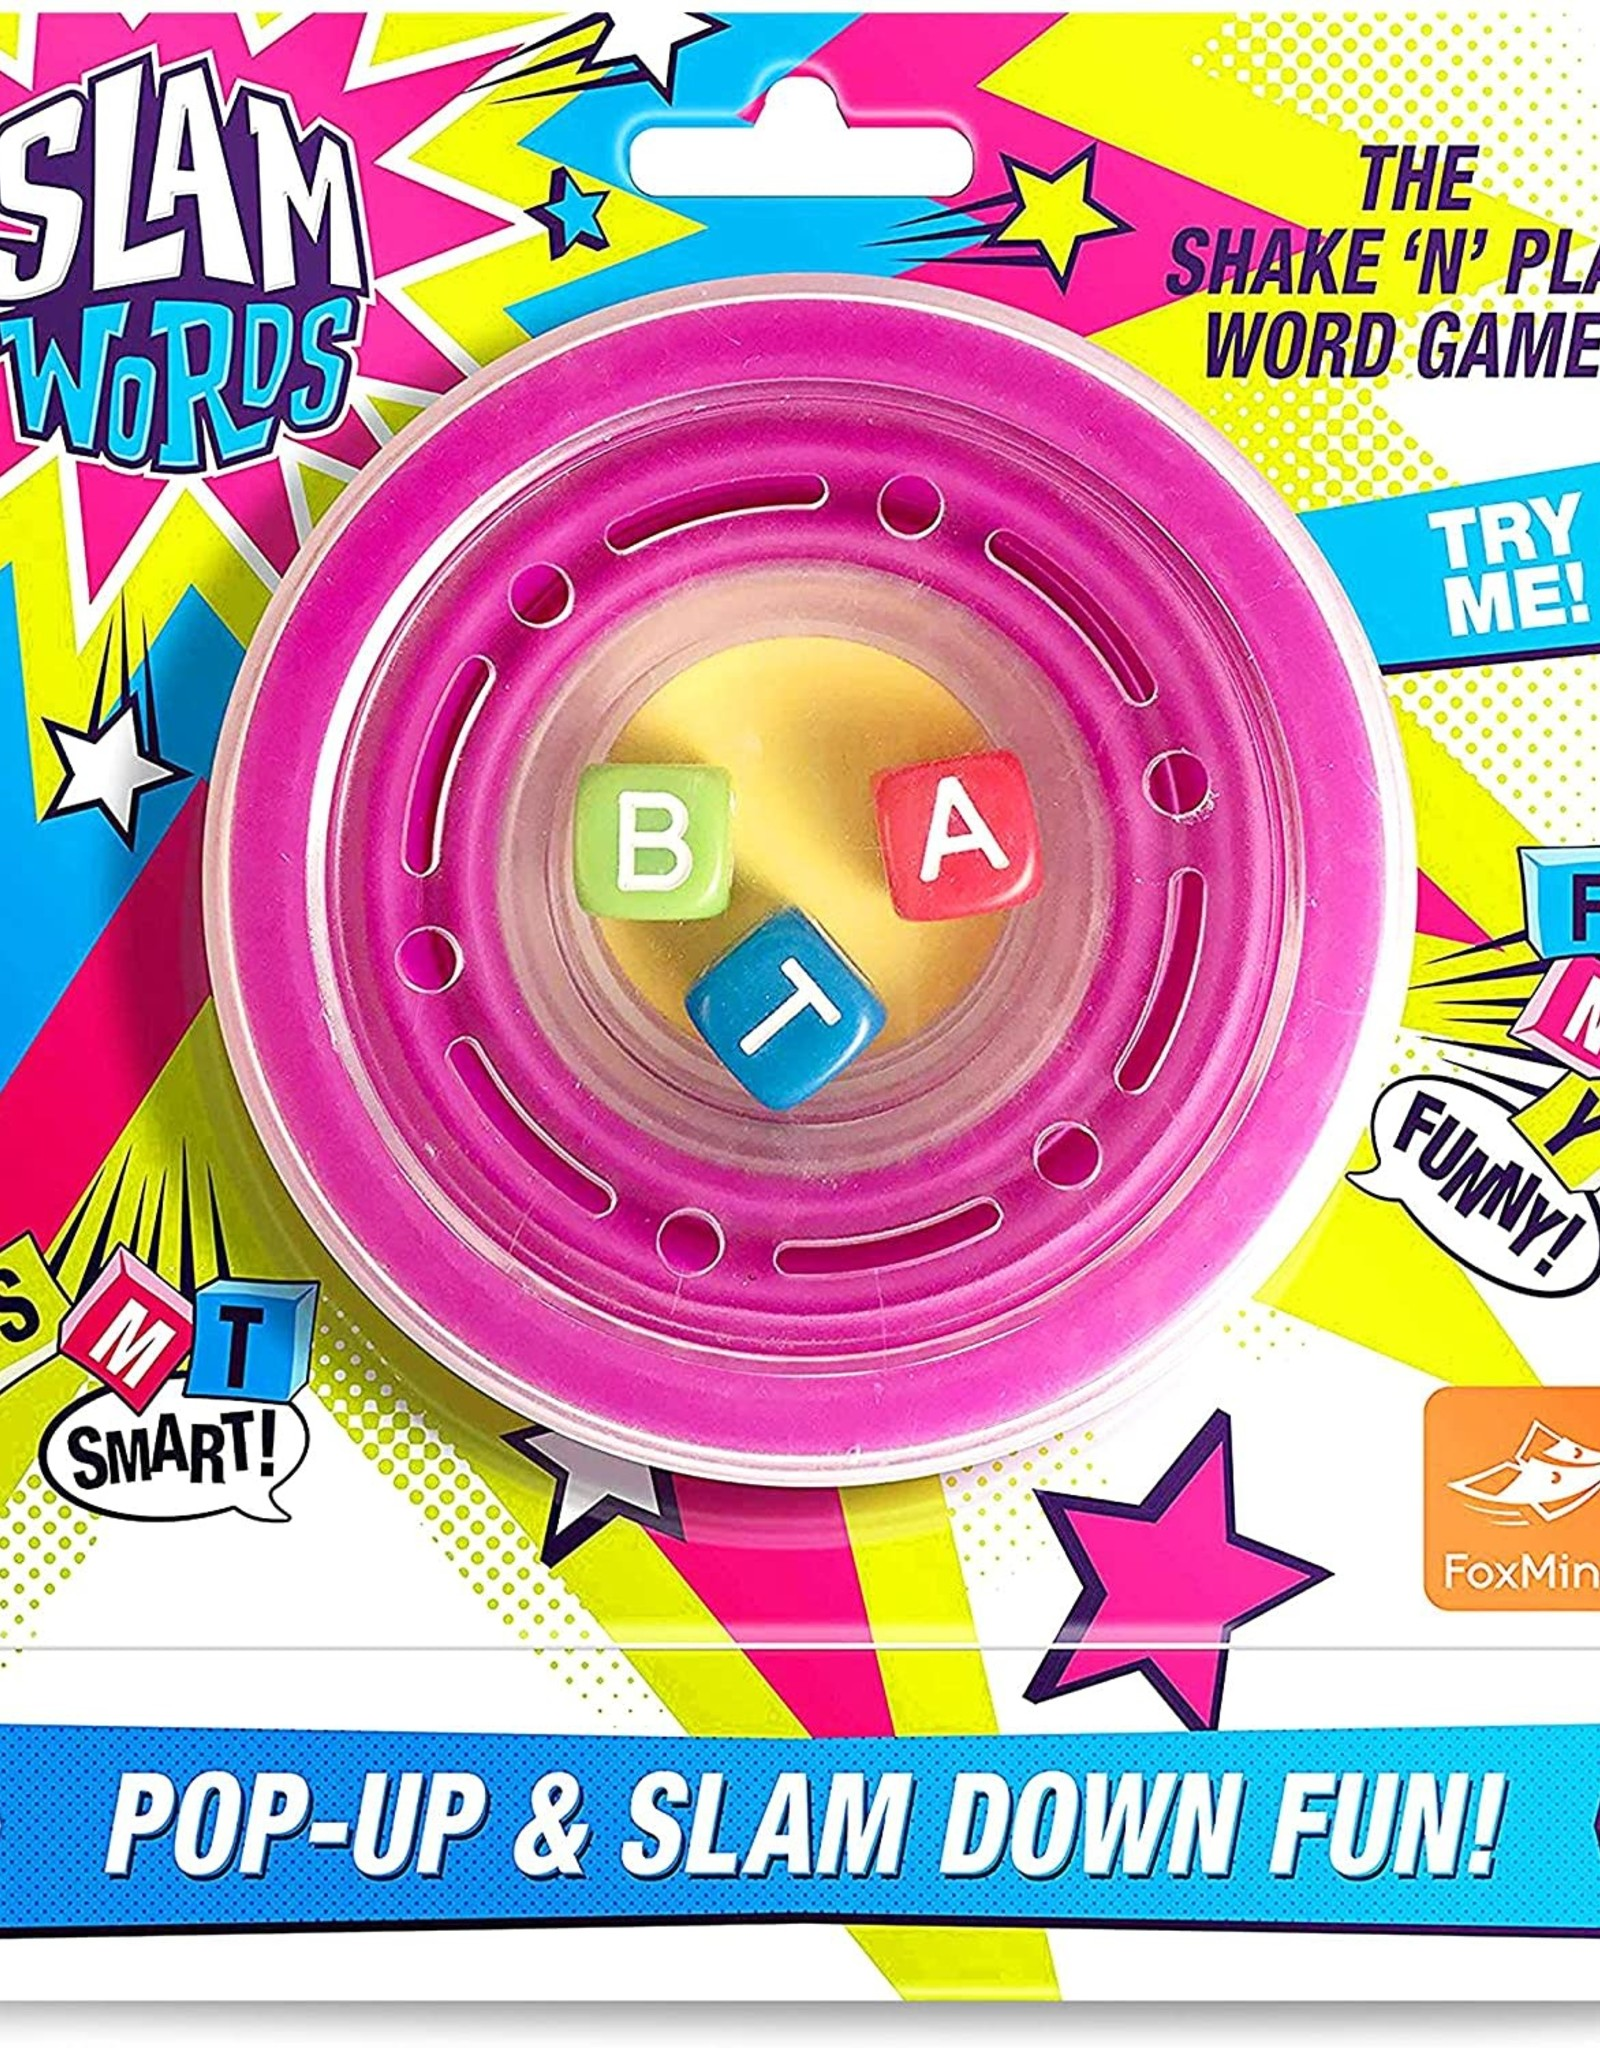 Foxmind Slam Words Game